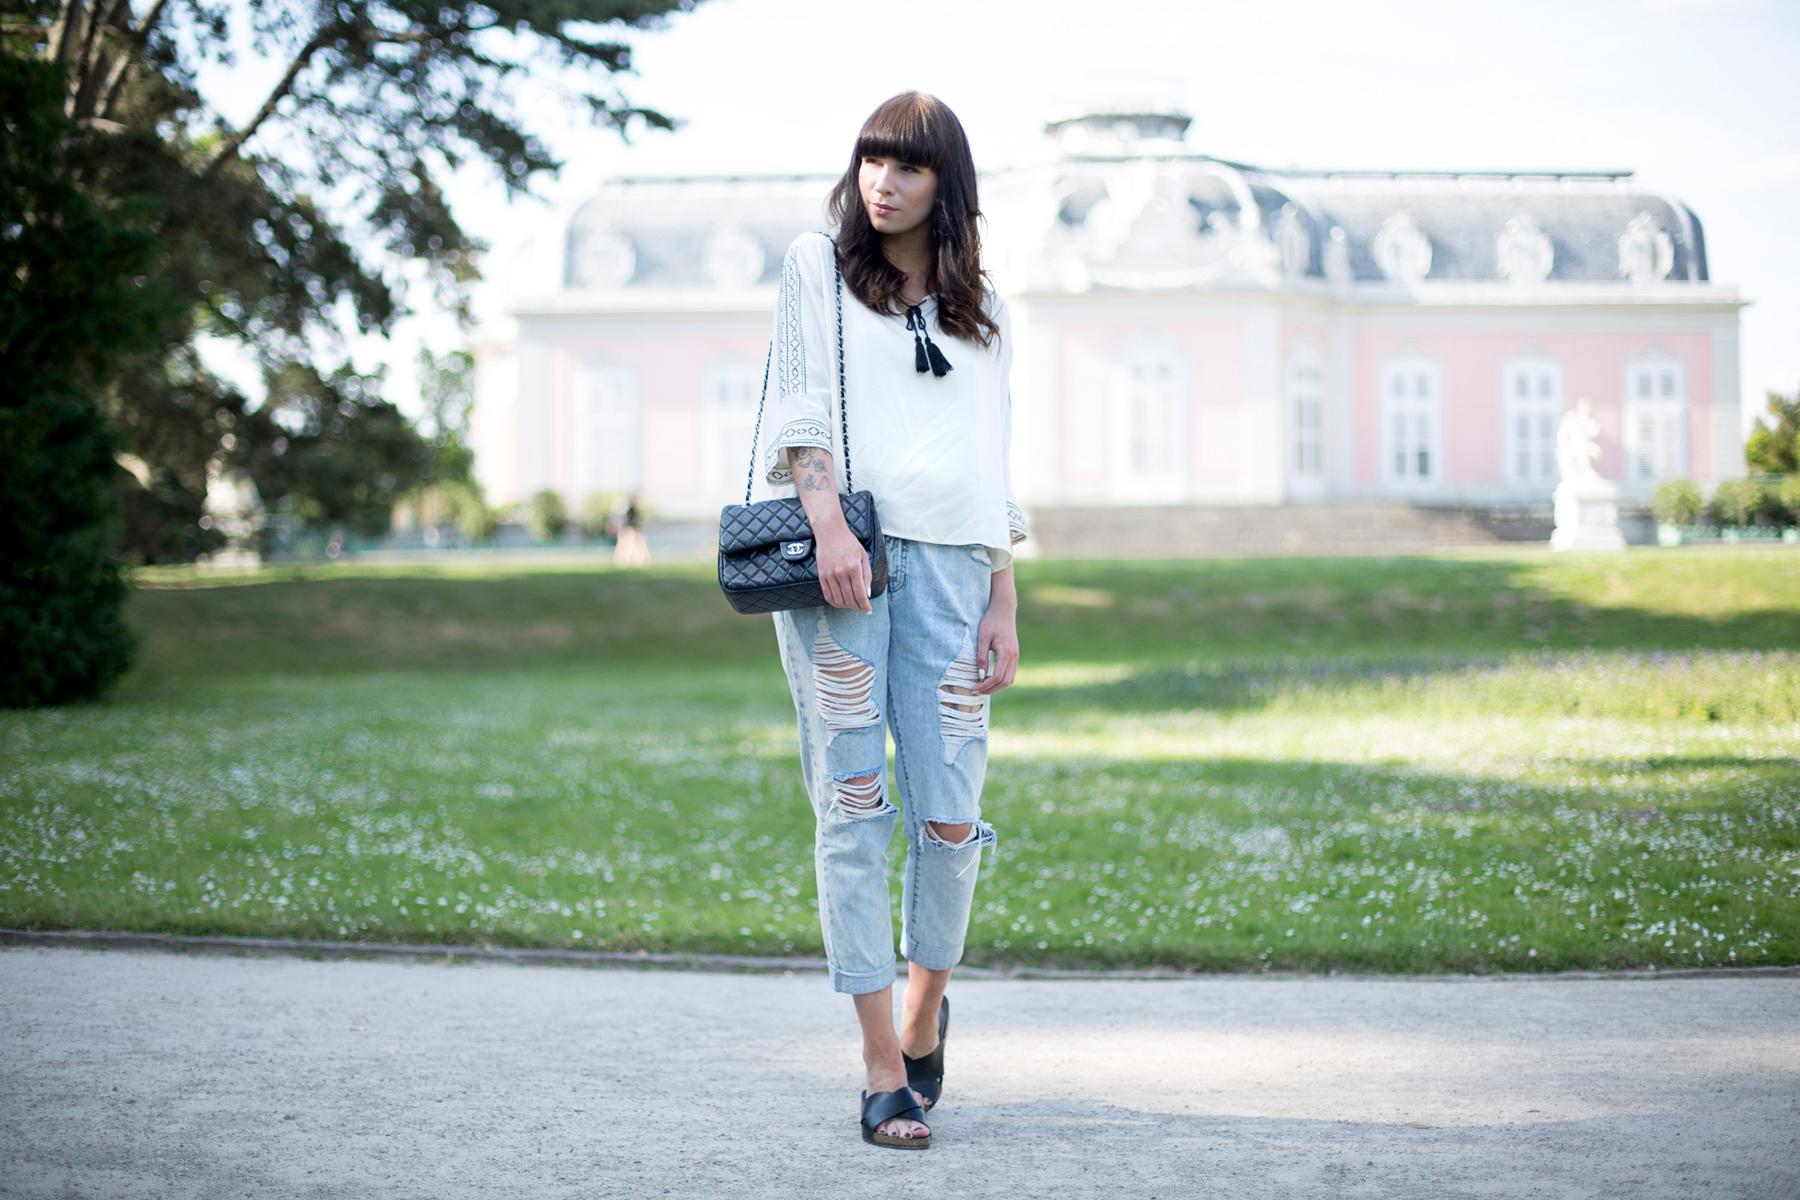 jeans girl ripped denim shopbop styling summer düsseldorf dusseldorf fashion blogger germany cats & dogs ricarda schernus 6